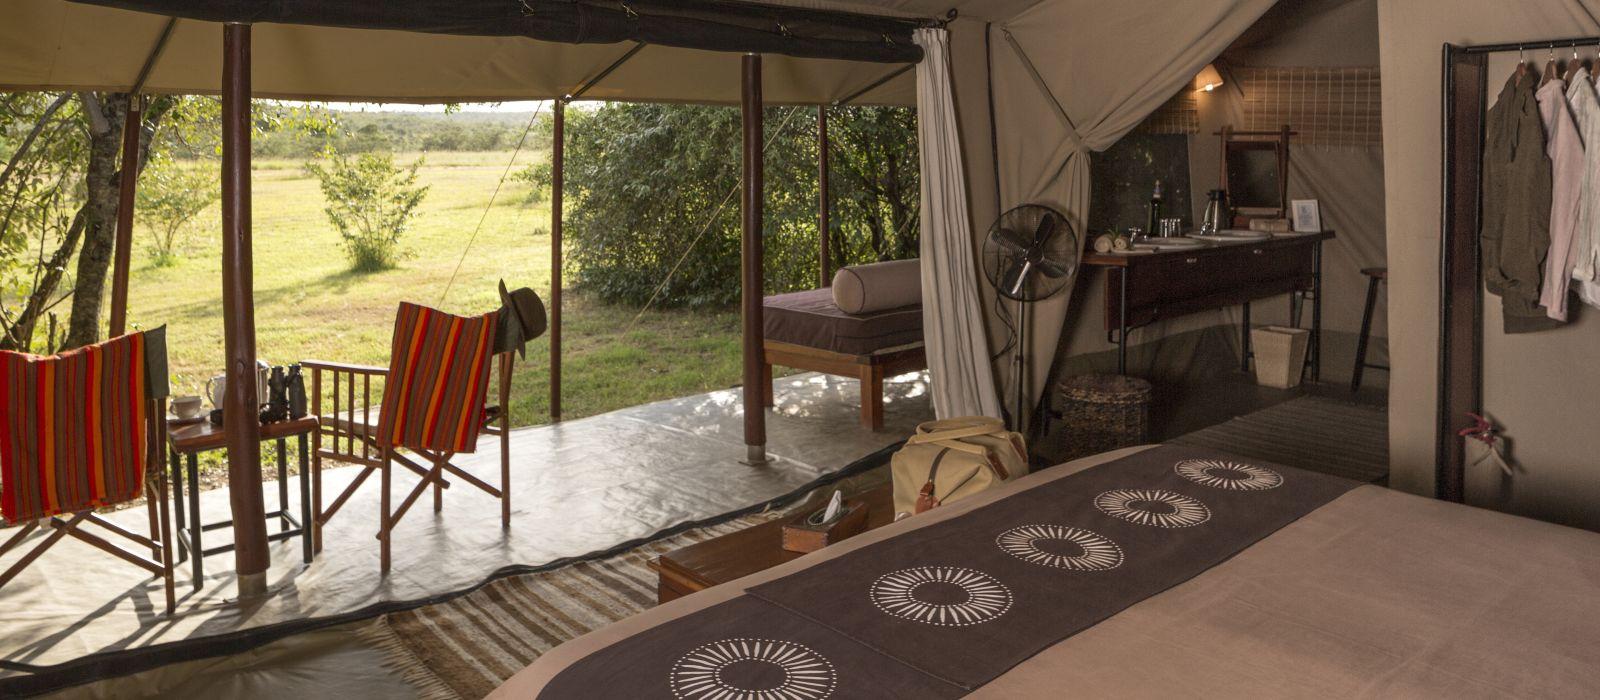 Kenia und Ruanda: Safari und Gorilla-Trekking Urlaub 6